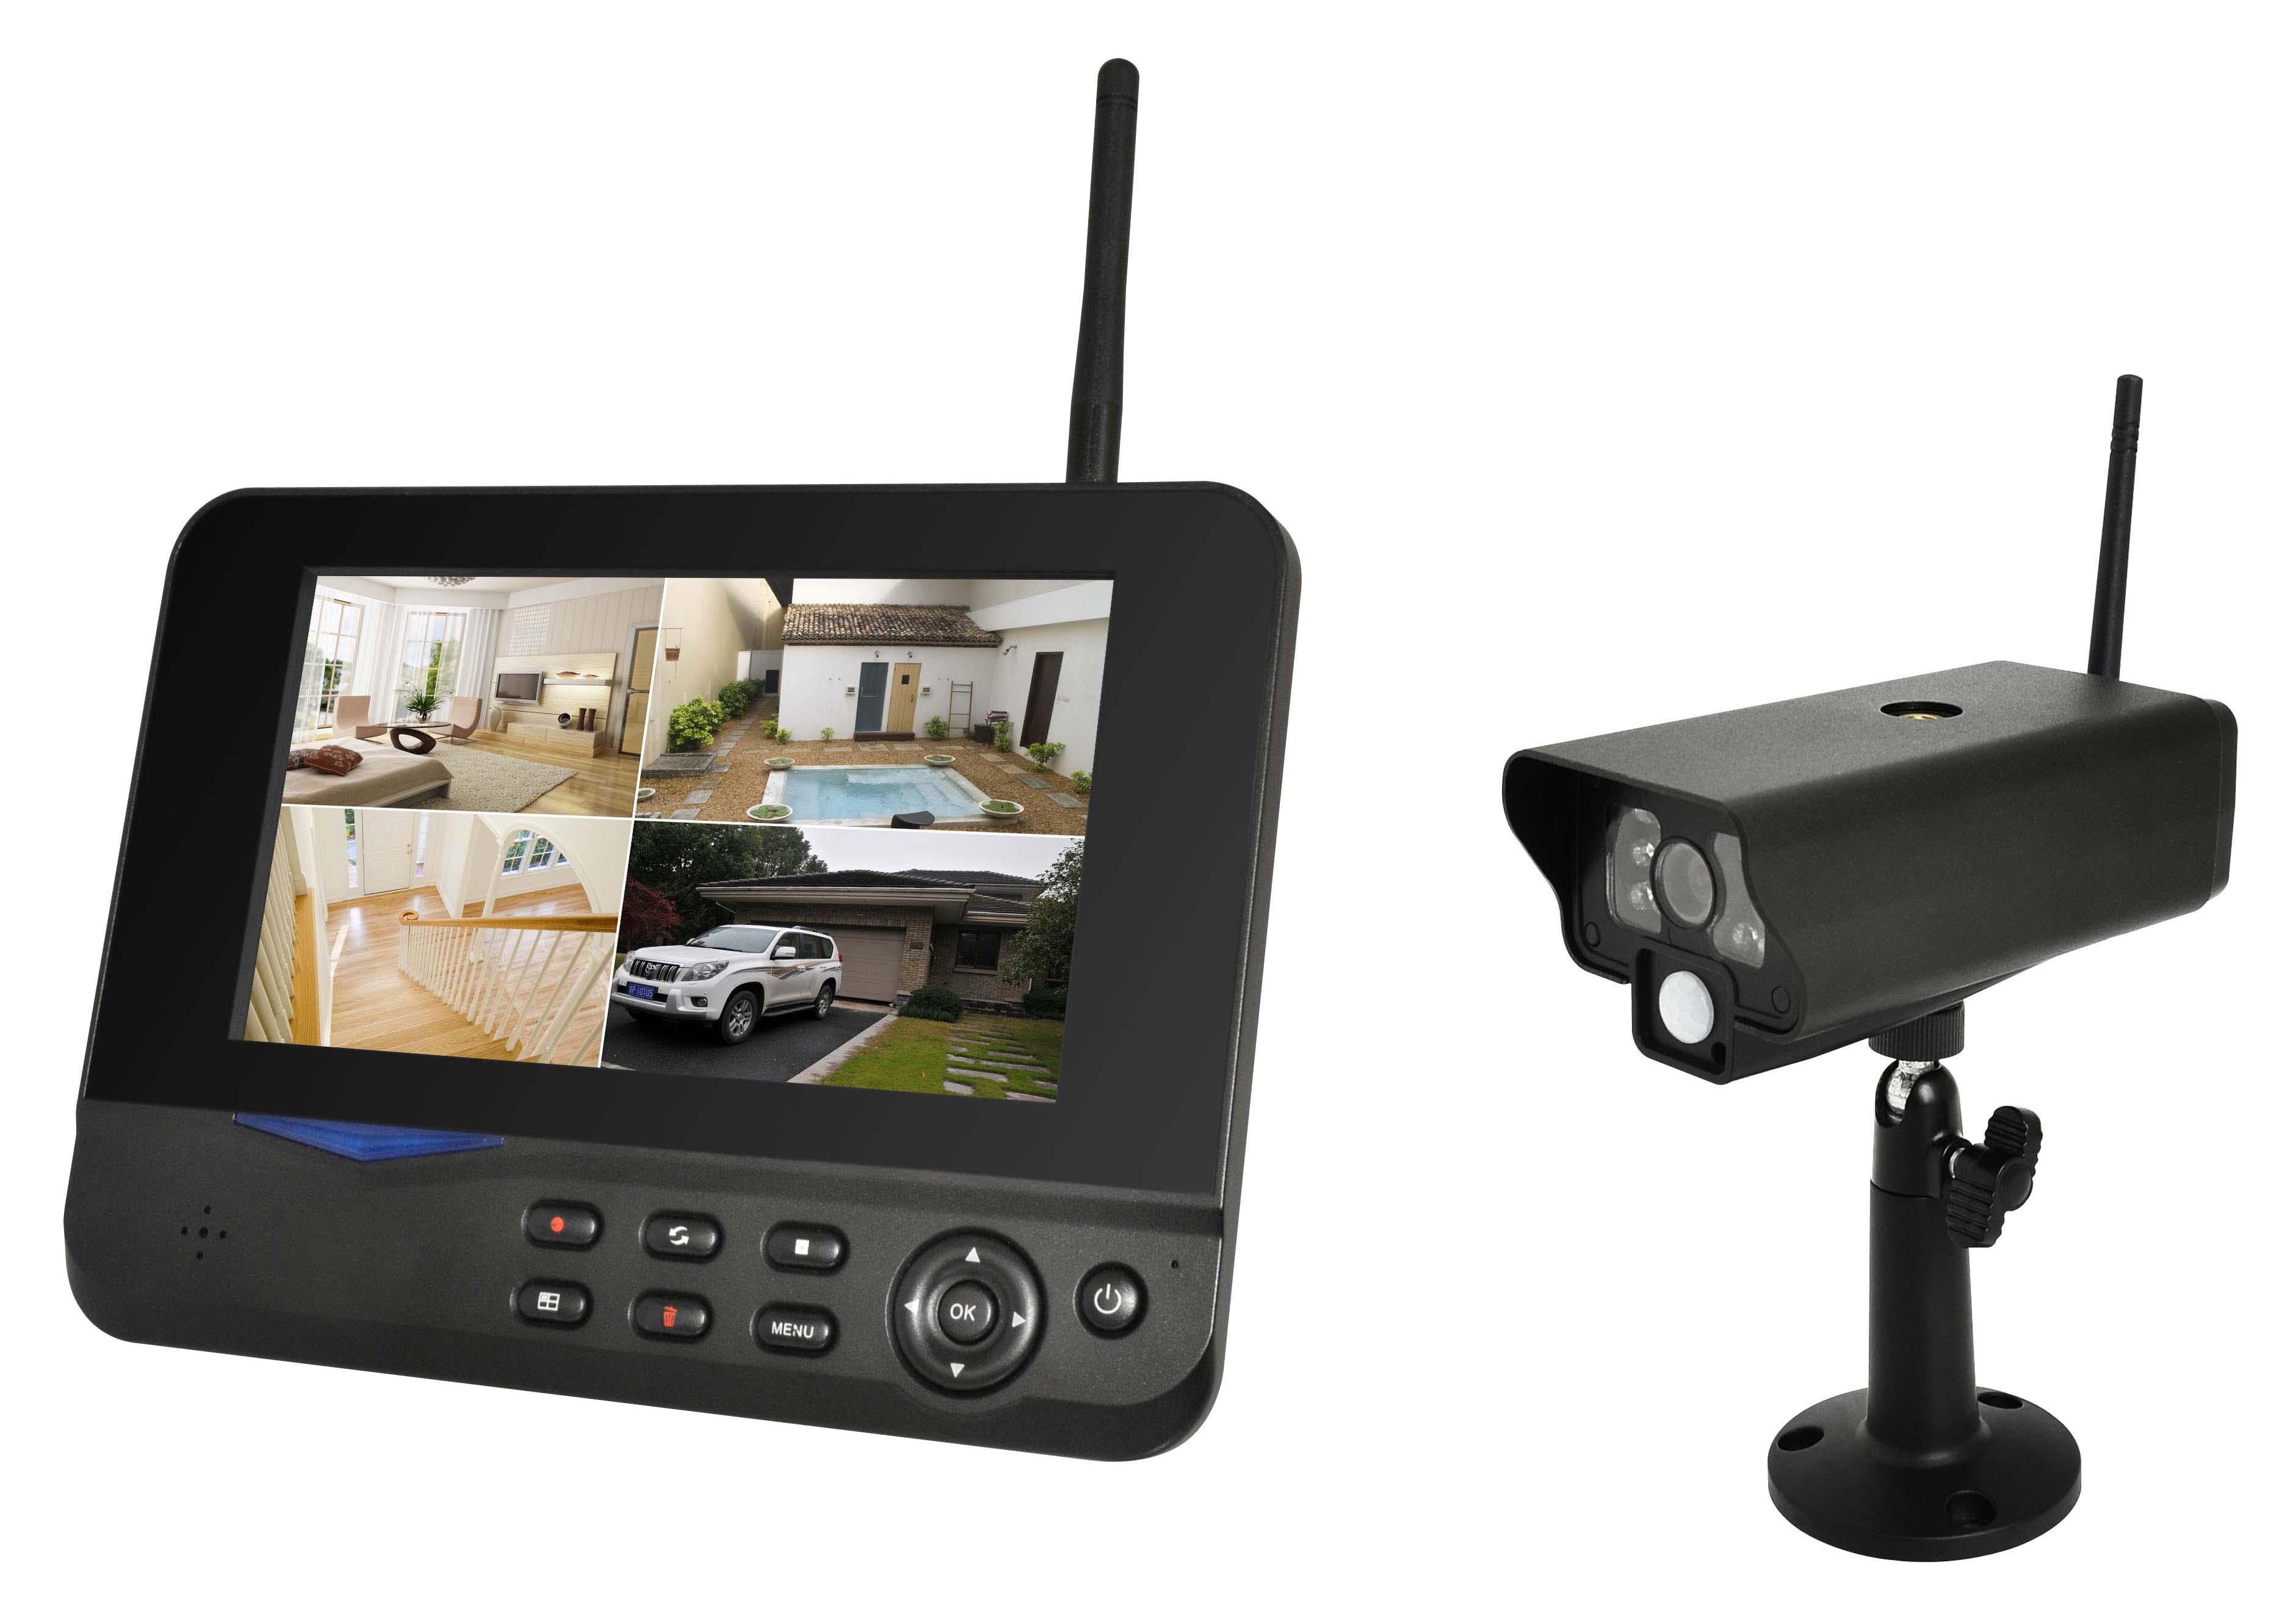 kkmoon berwachungskamera set mit monitor wireless wifi. Black Bedroom Furniture Sets. Home Design Ideas